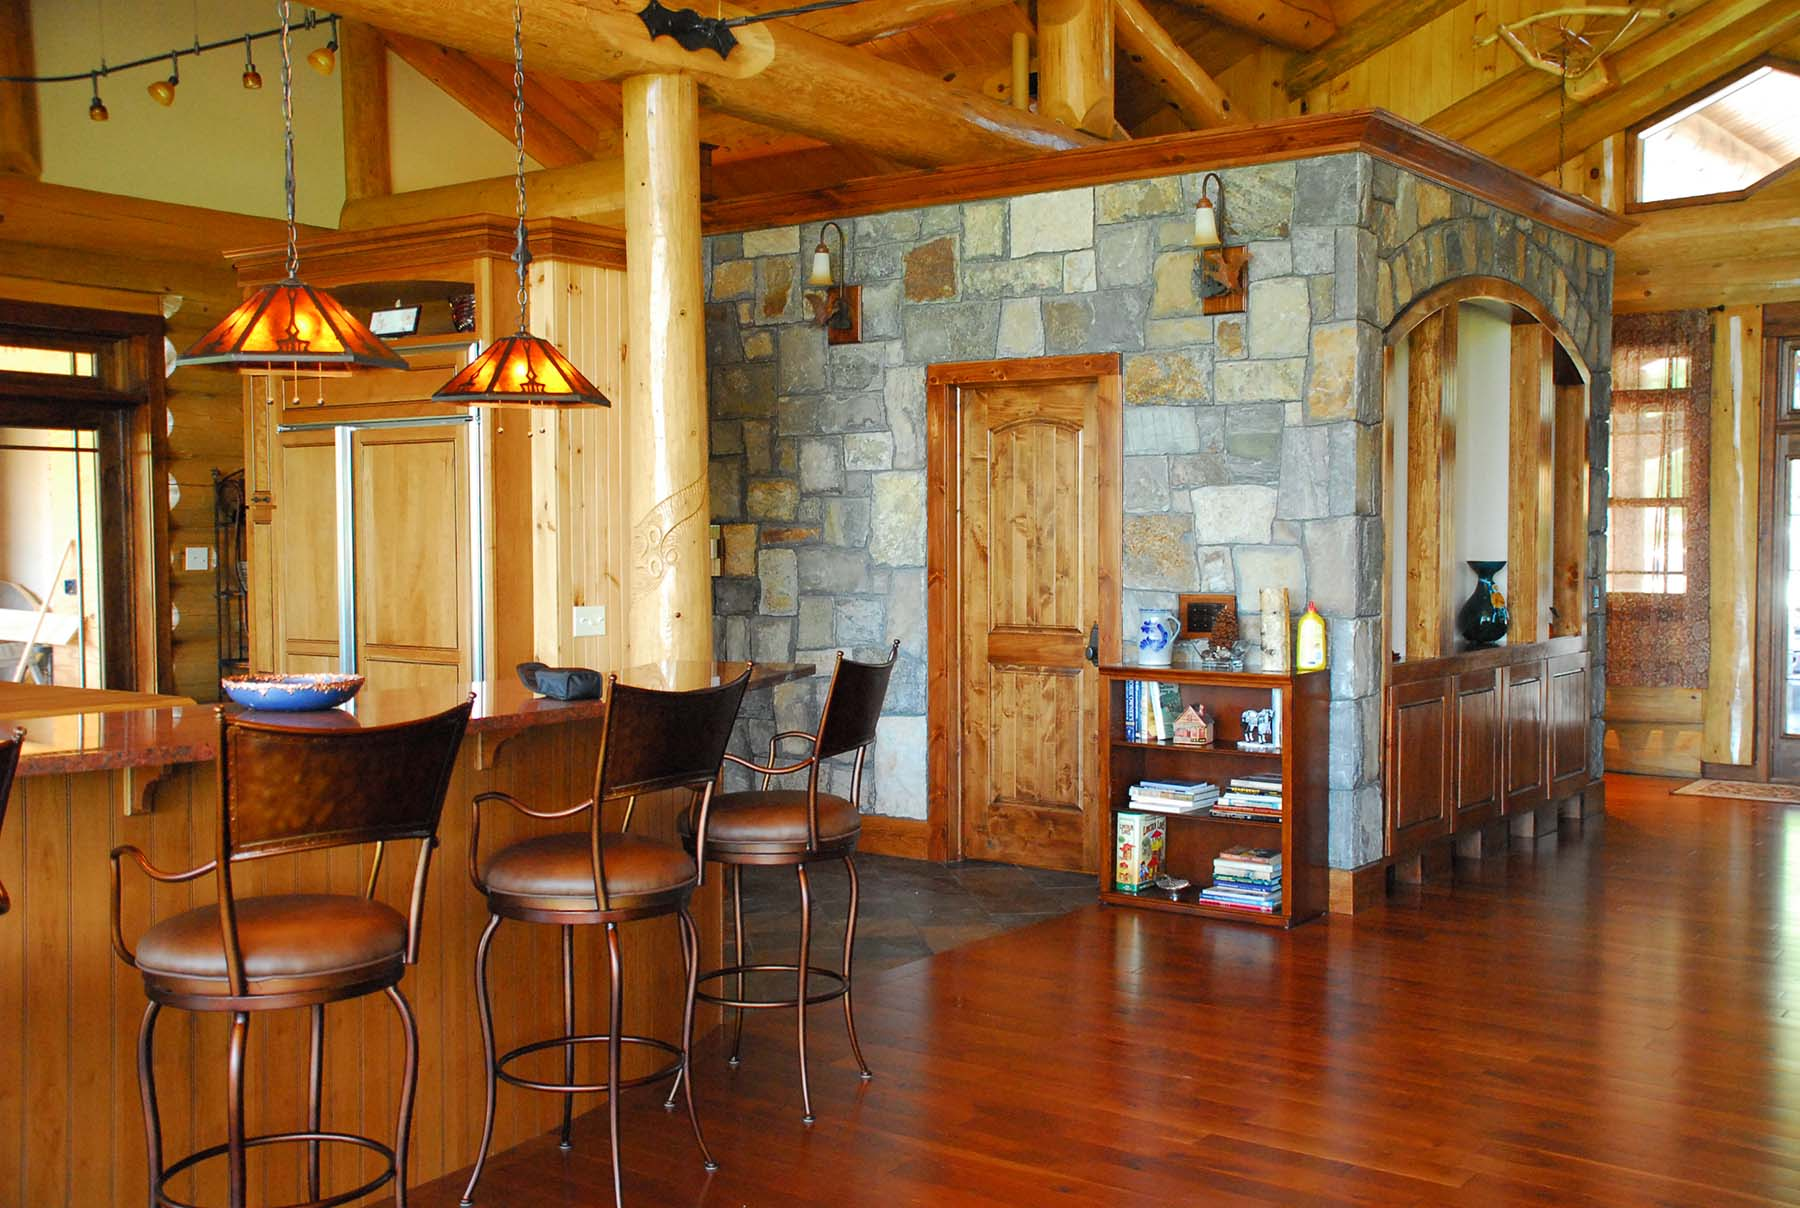 saratoga granite indoor walls in residential kitchen